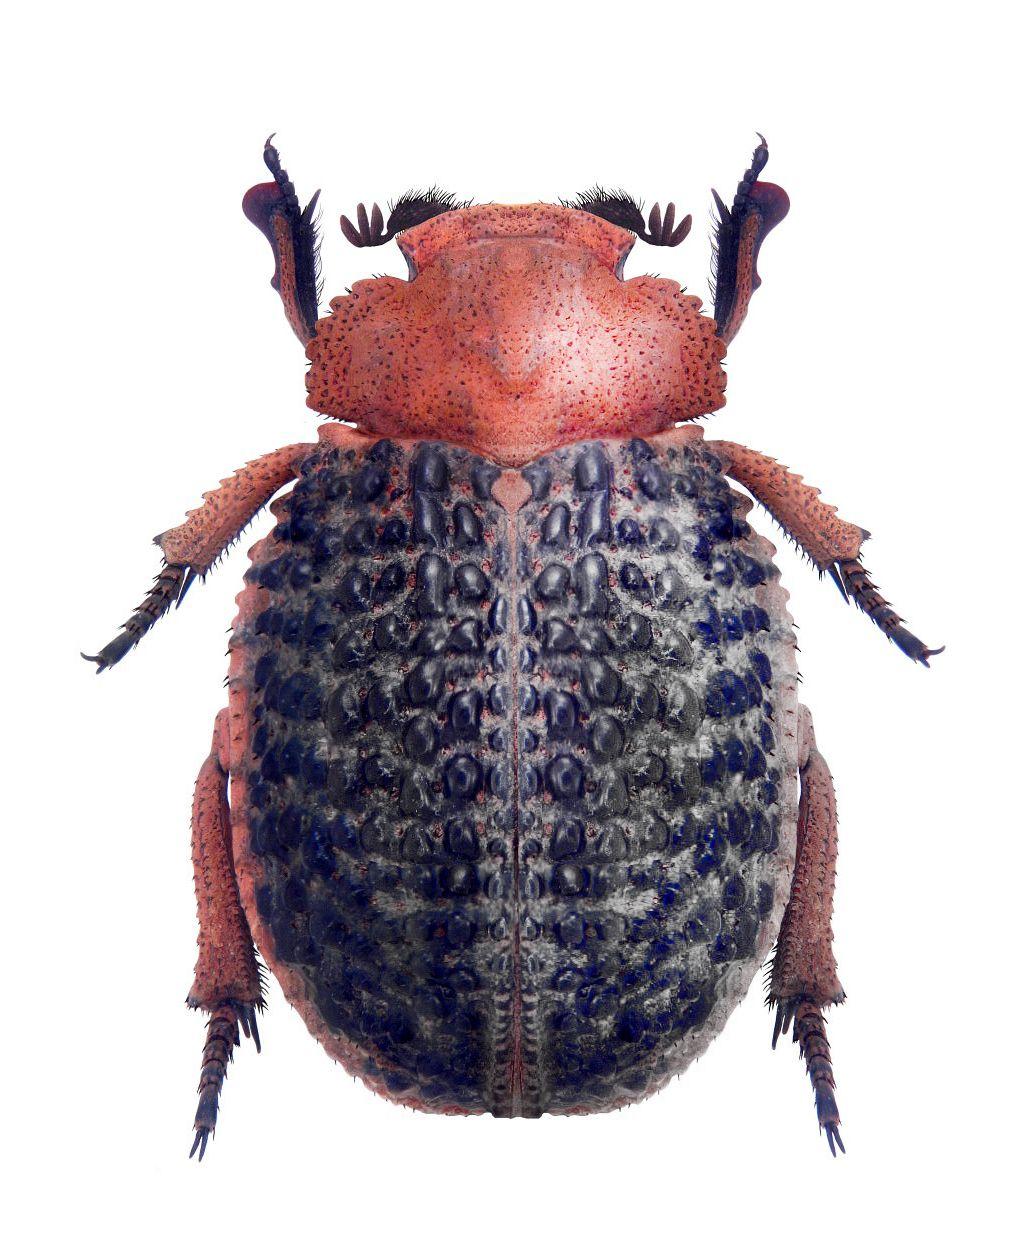 Trox Baccatus 甲虫類 タマムシ 虫